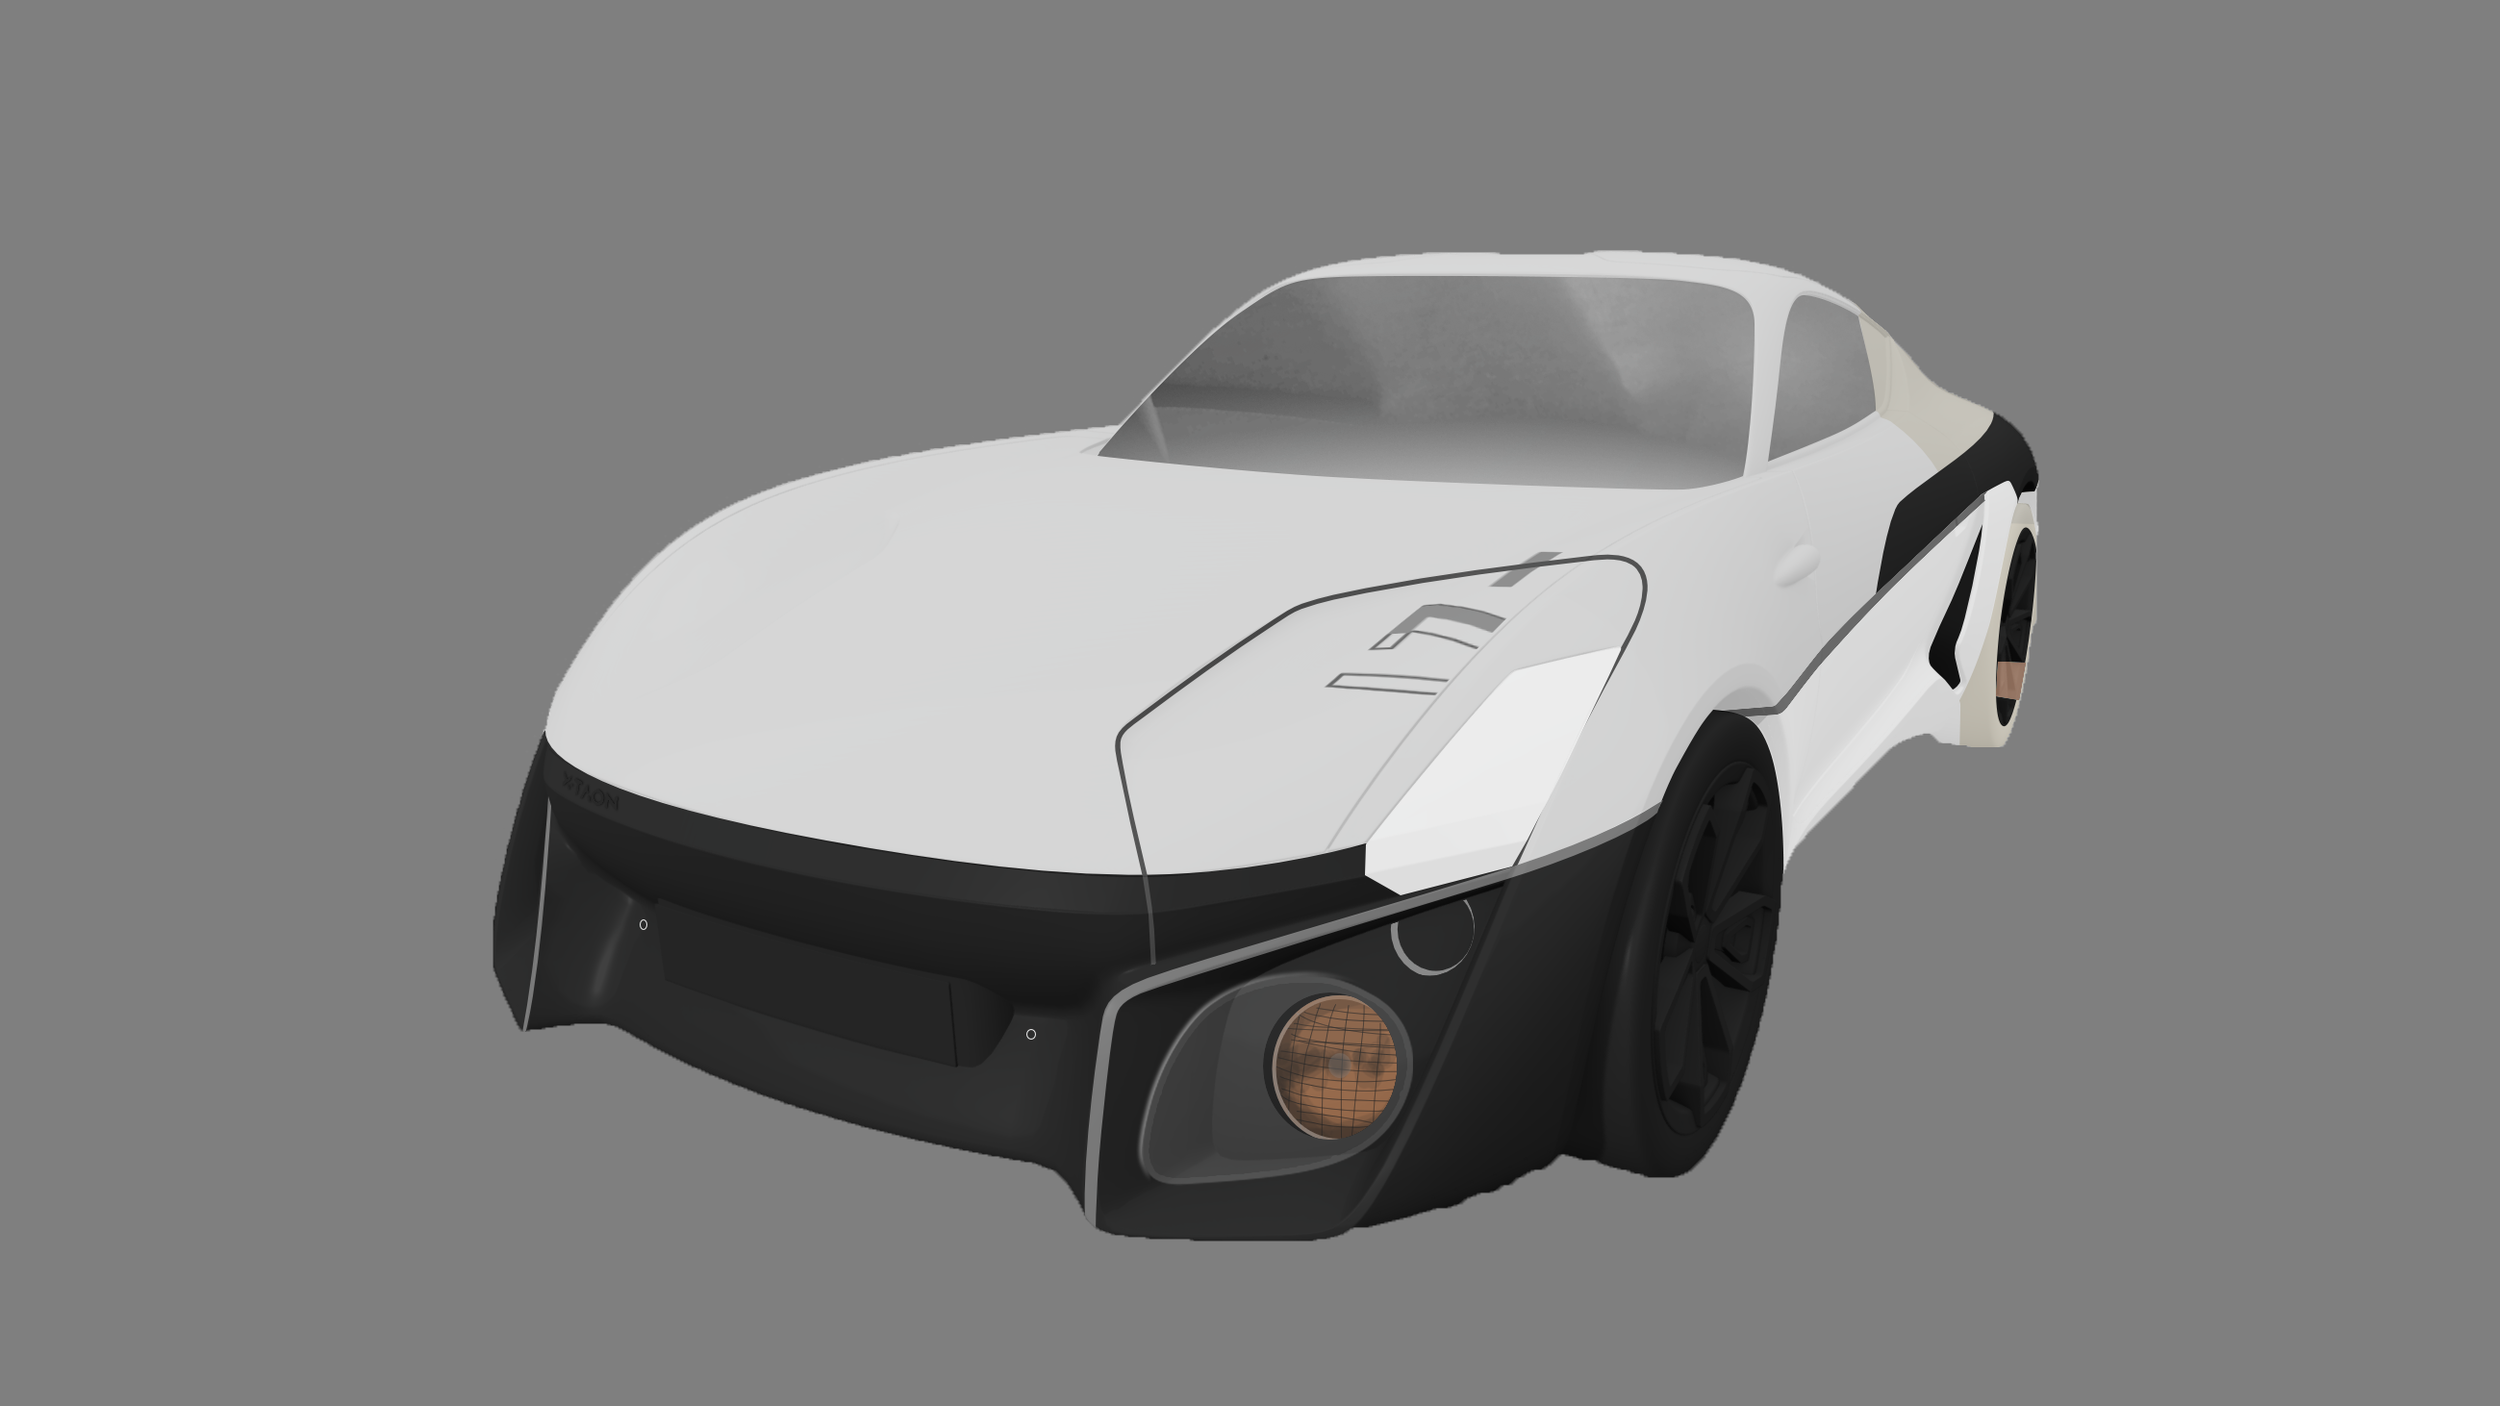 thomas charier xtaon contest concept car sketch design front